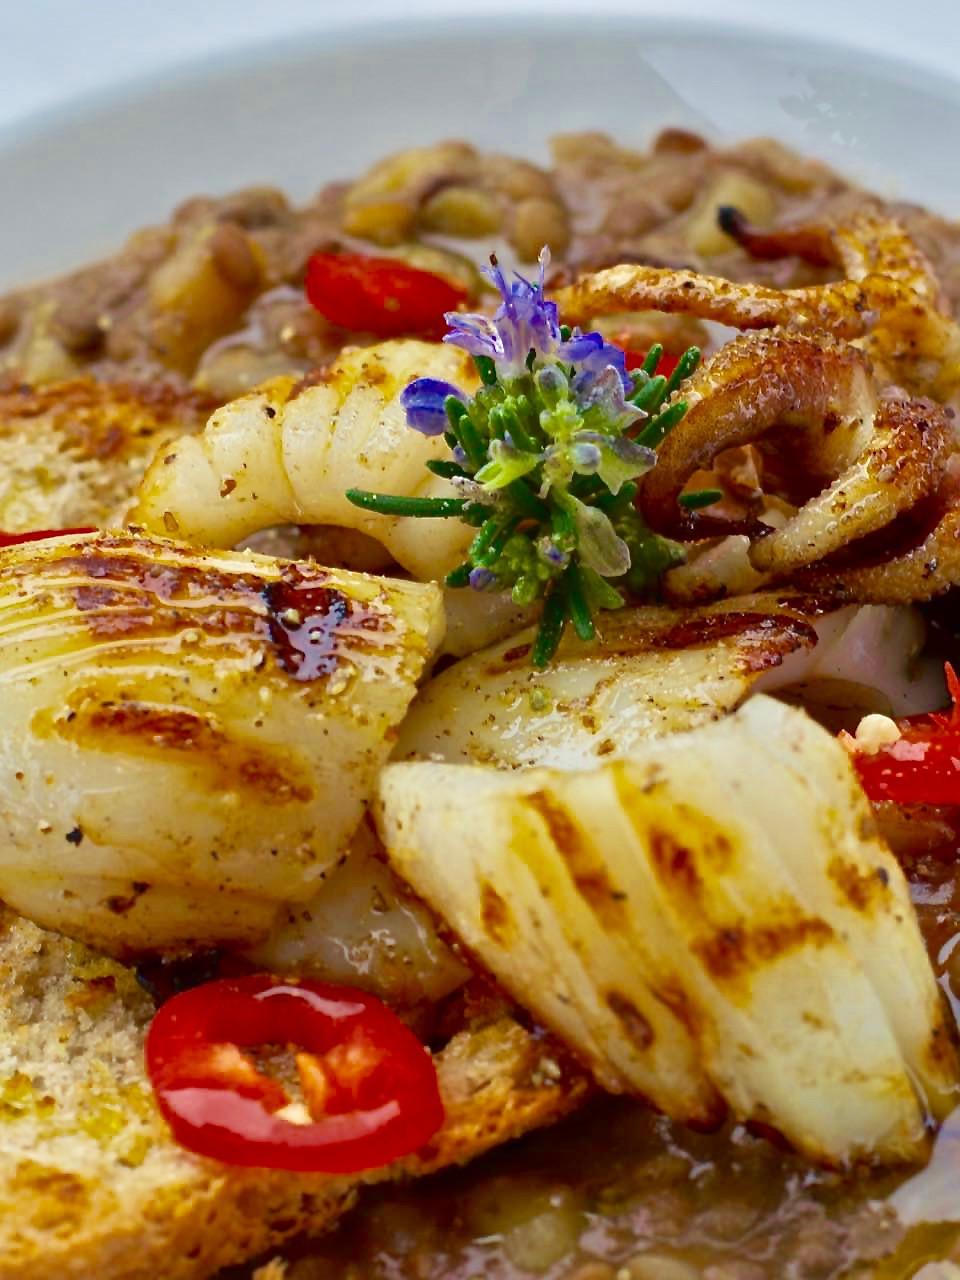 Lenticchie di Ustica con seppie alla plancia - Ustica lentils soup with Cuttlefish on a hot plate